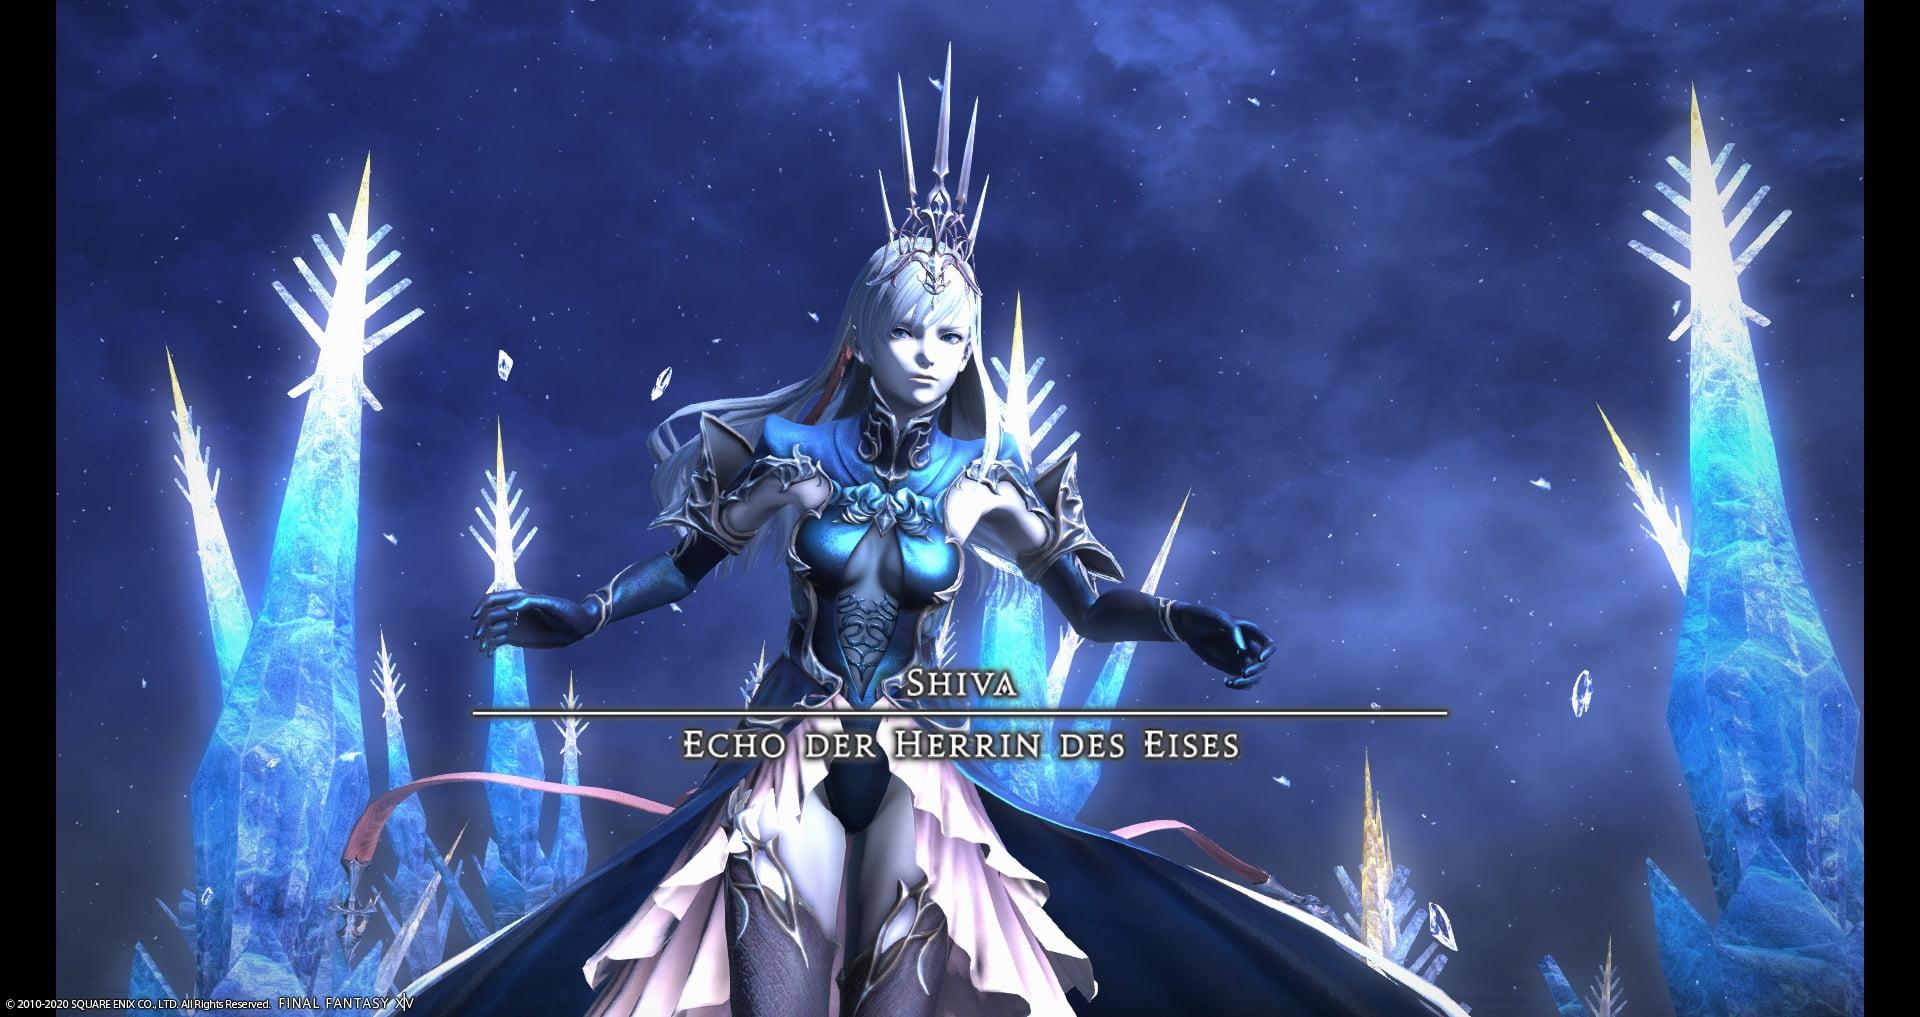 Final Fantasy Xiv Raid Guide Edens Resonanz Erstarrung